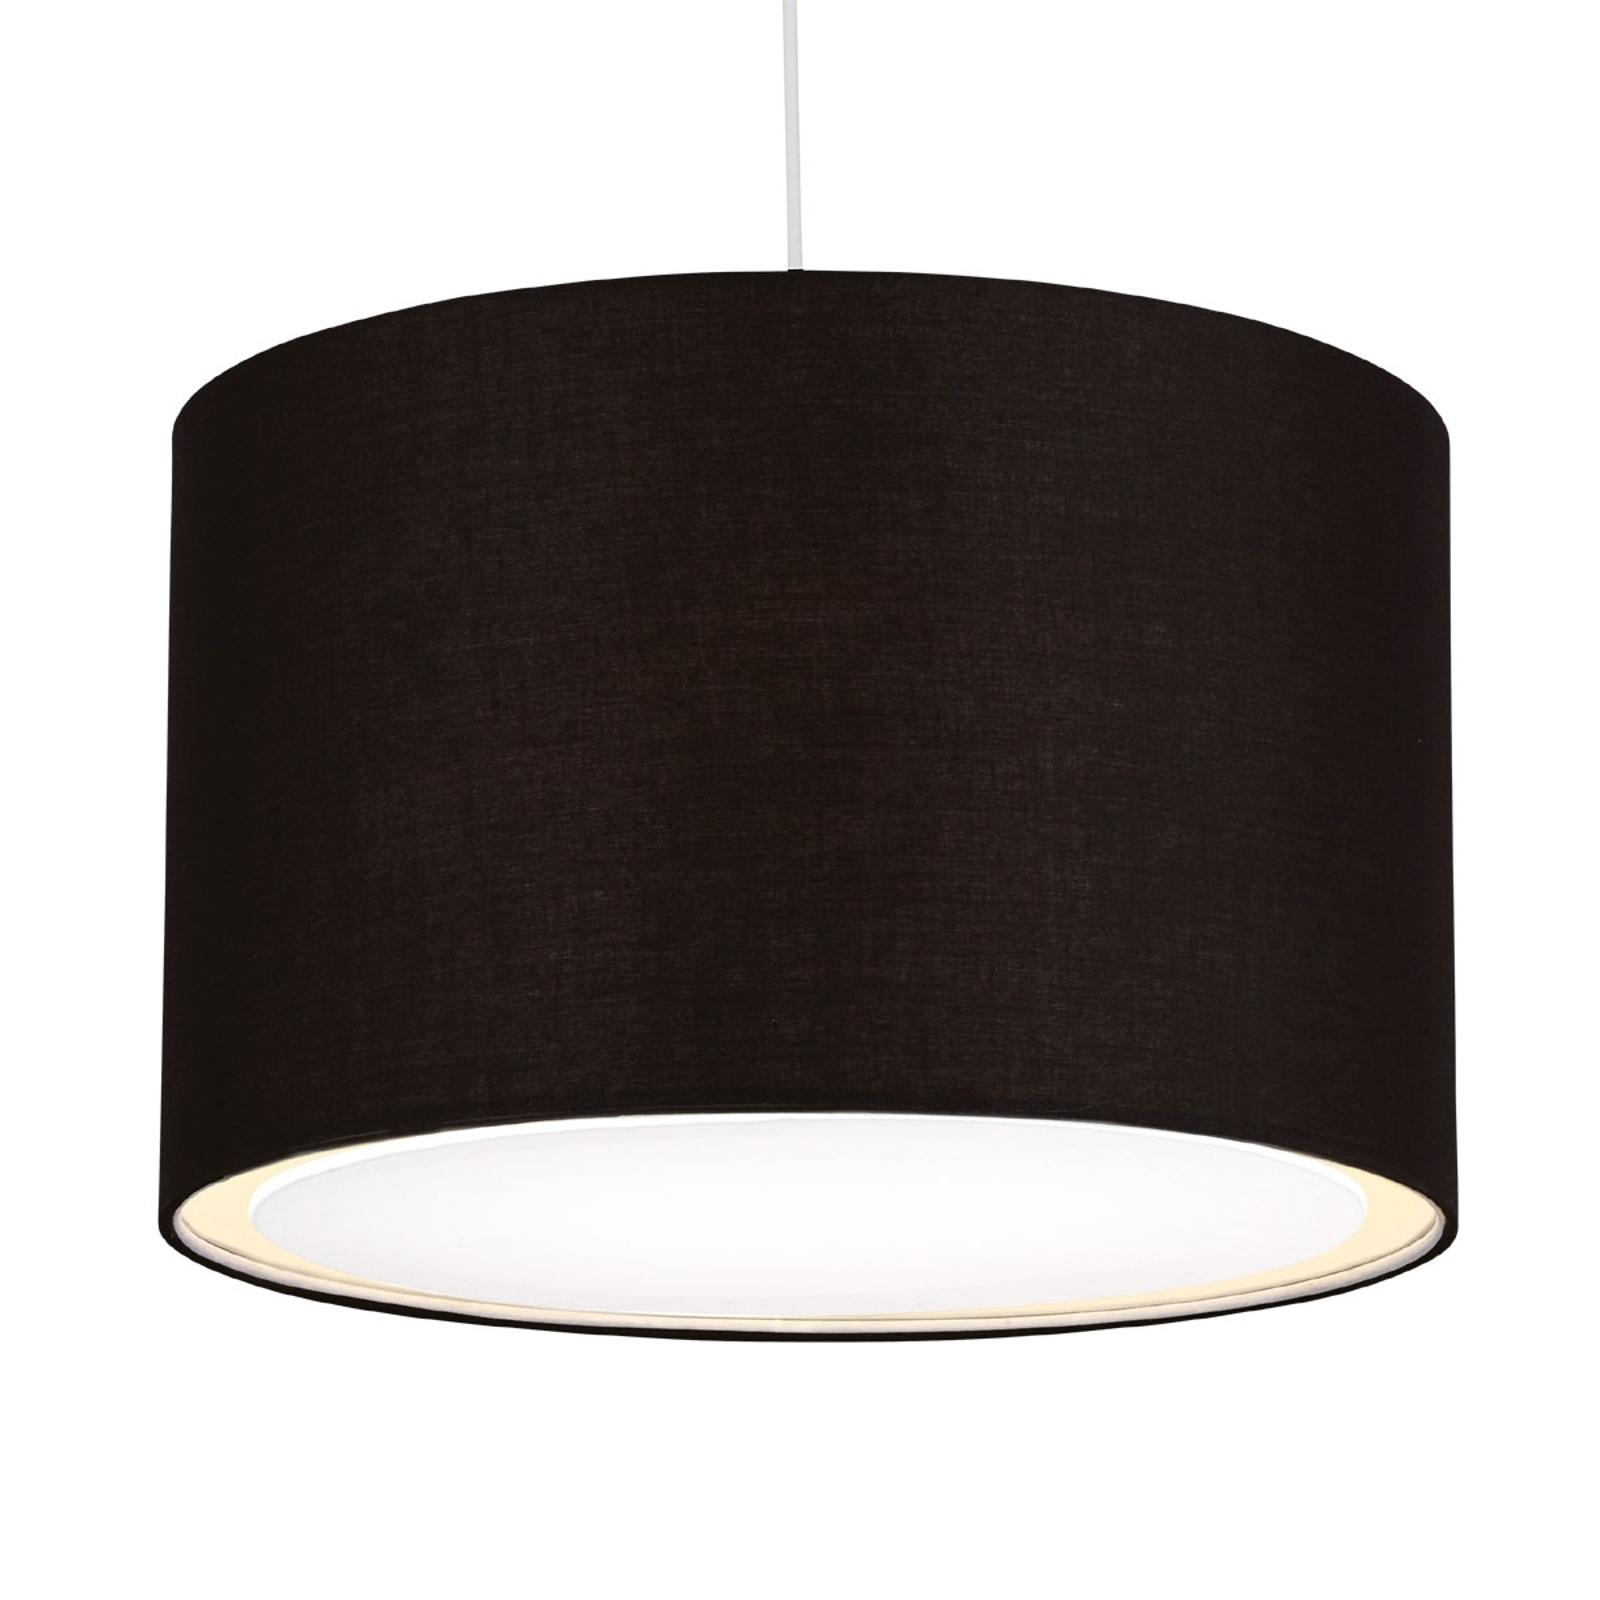 Klassiek-moderne hanglamp CLARIE, zwart